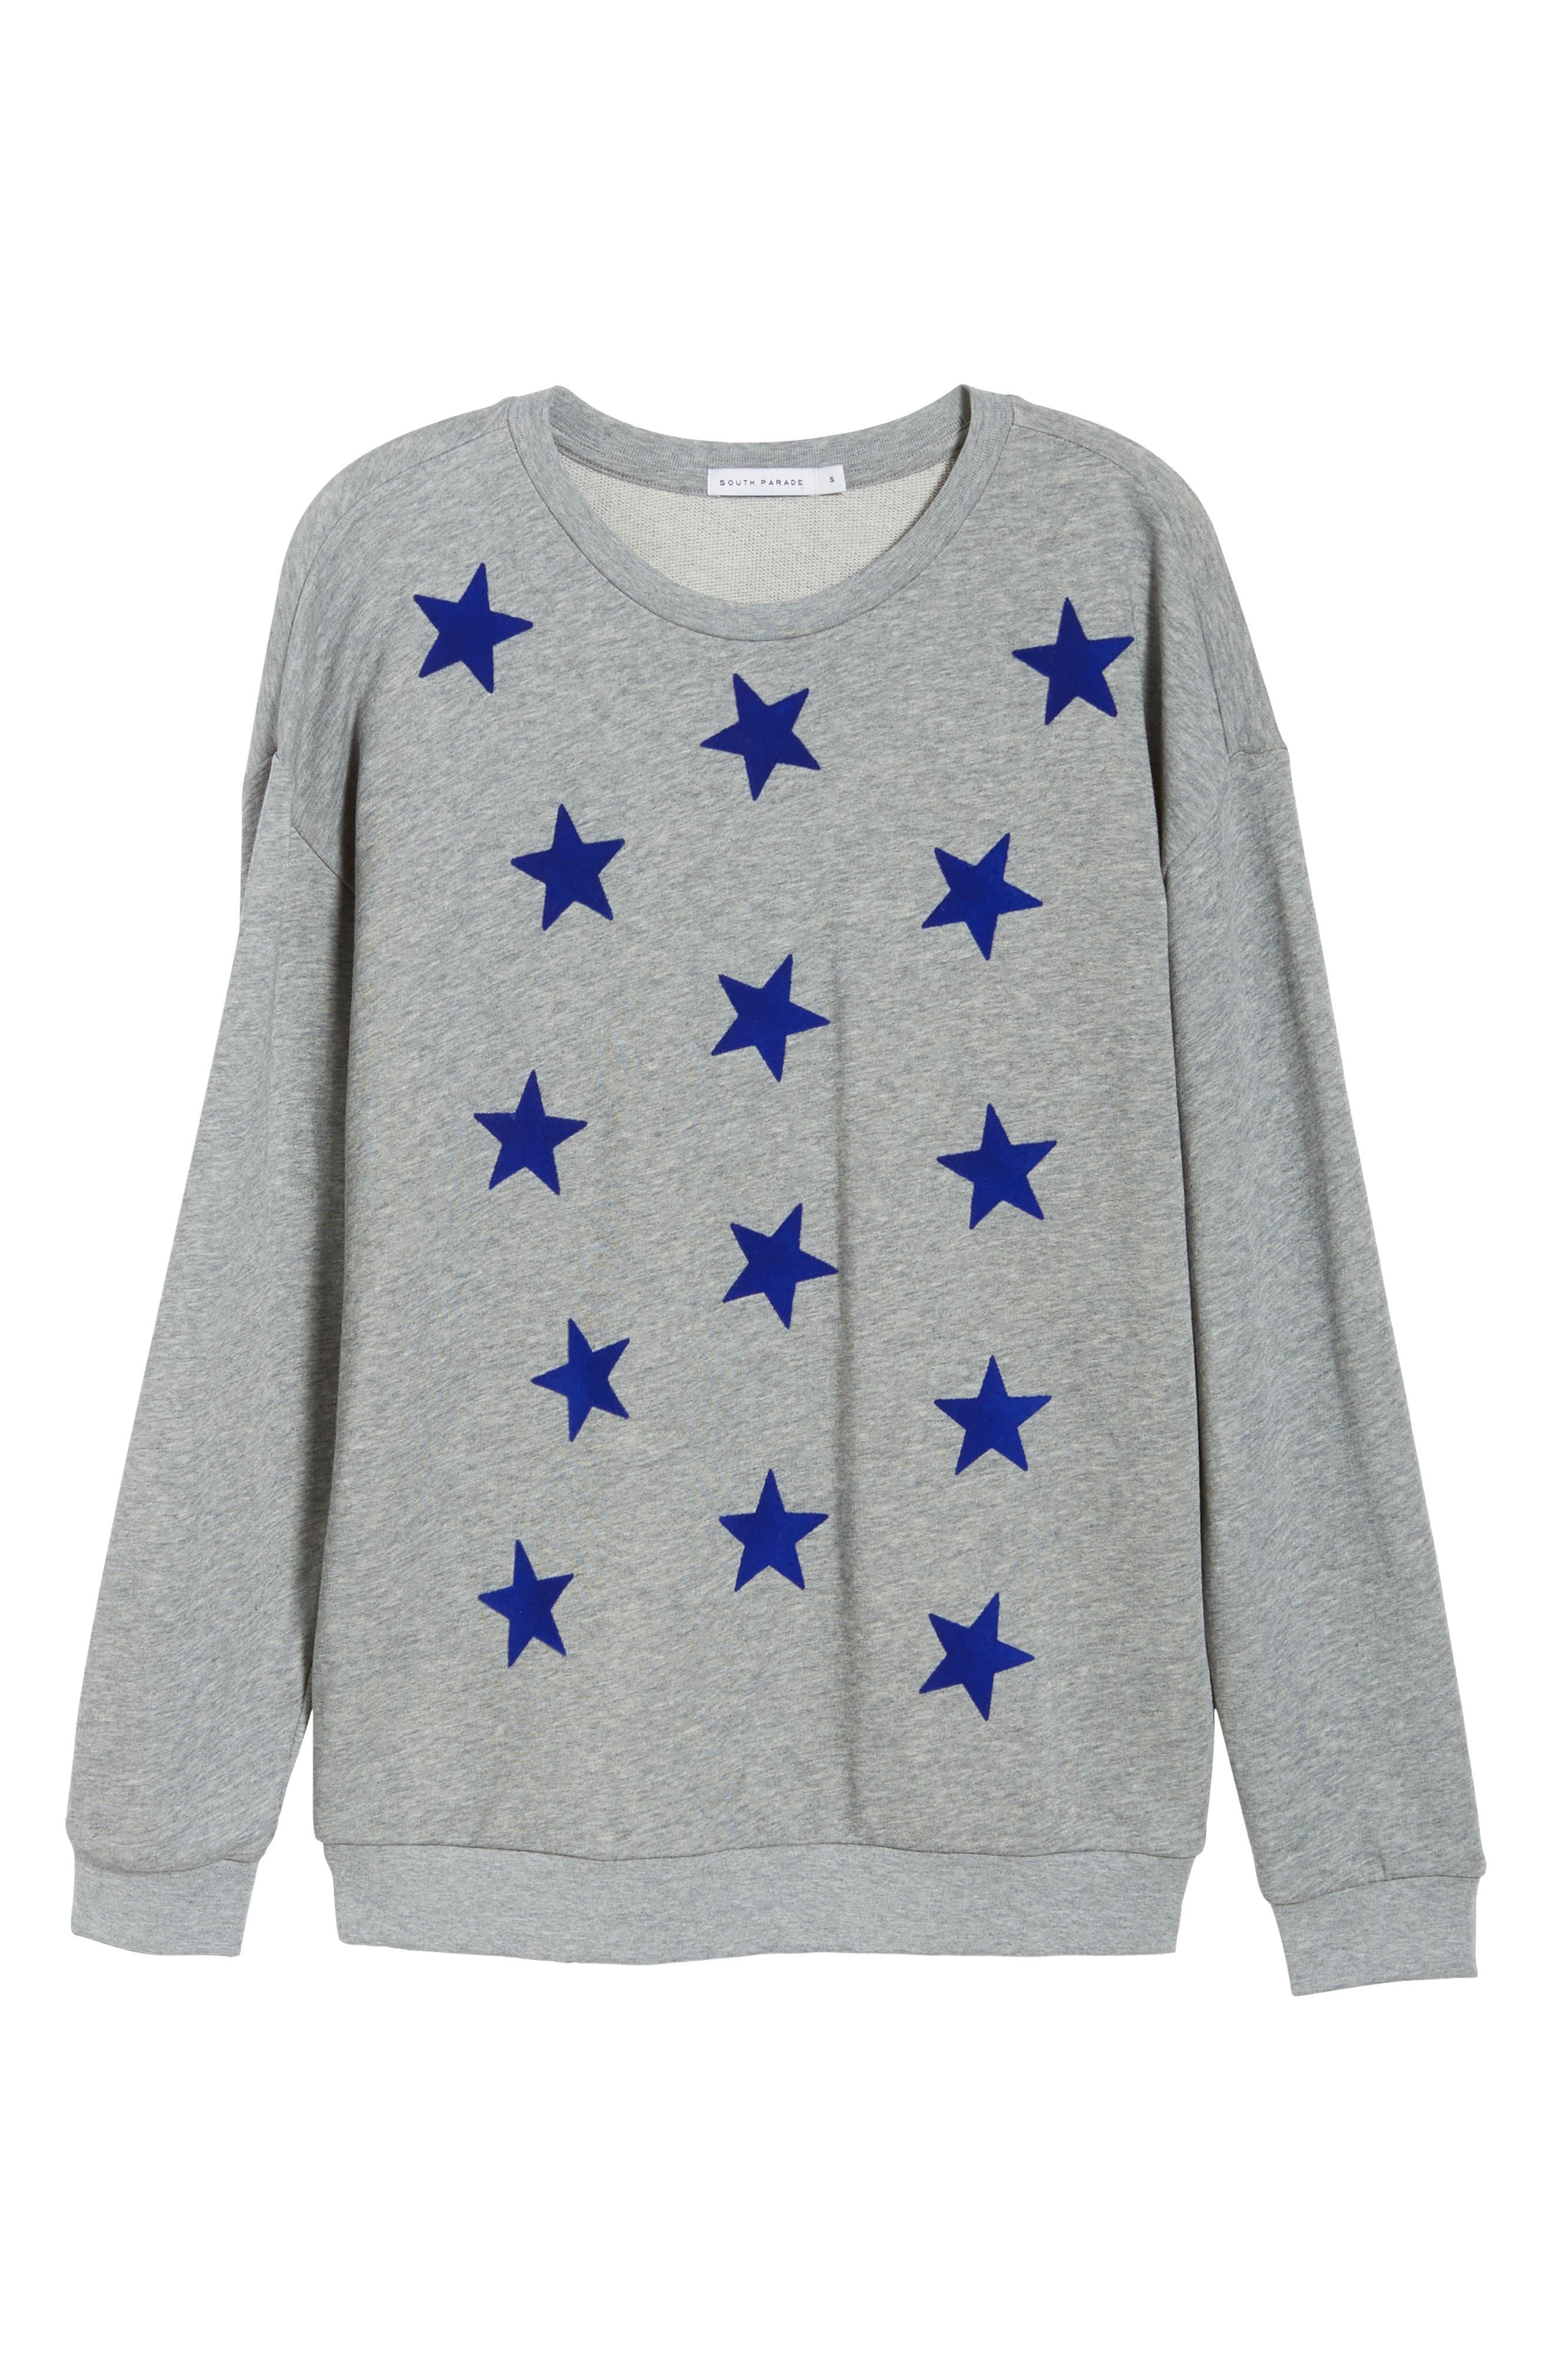 Alexa Stars Sweatshirt,                             Alternate thumbnail 6, color,                             GREY